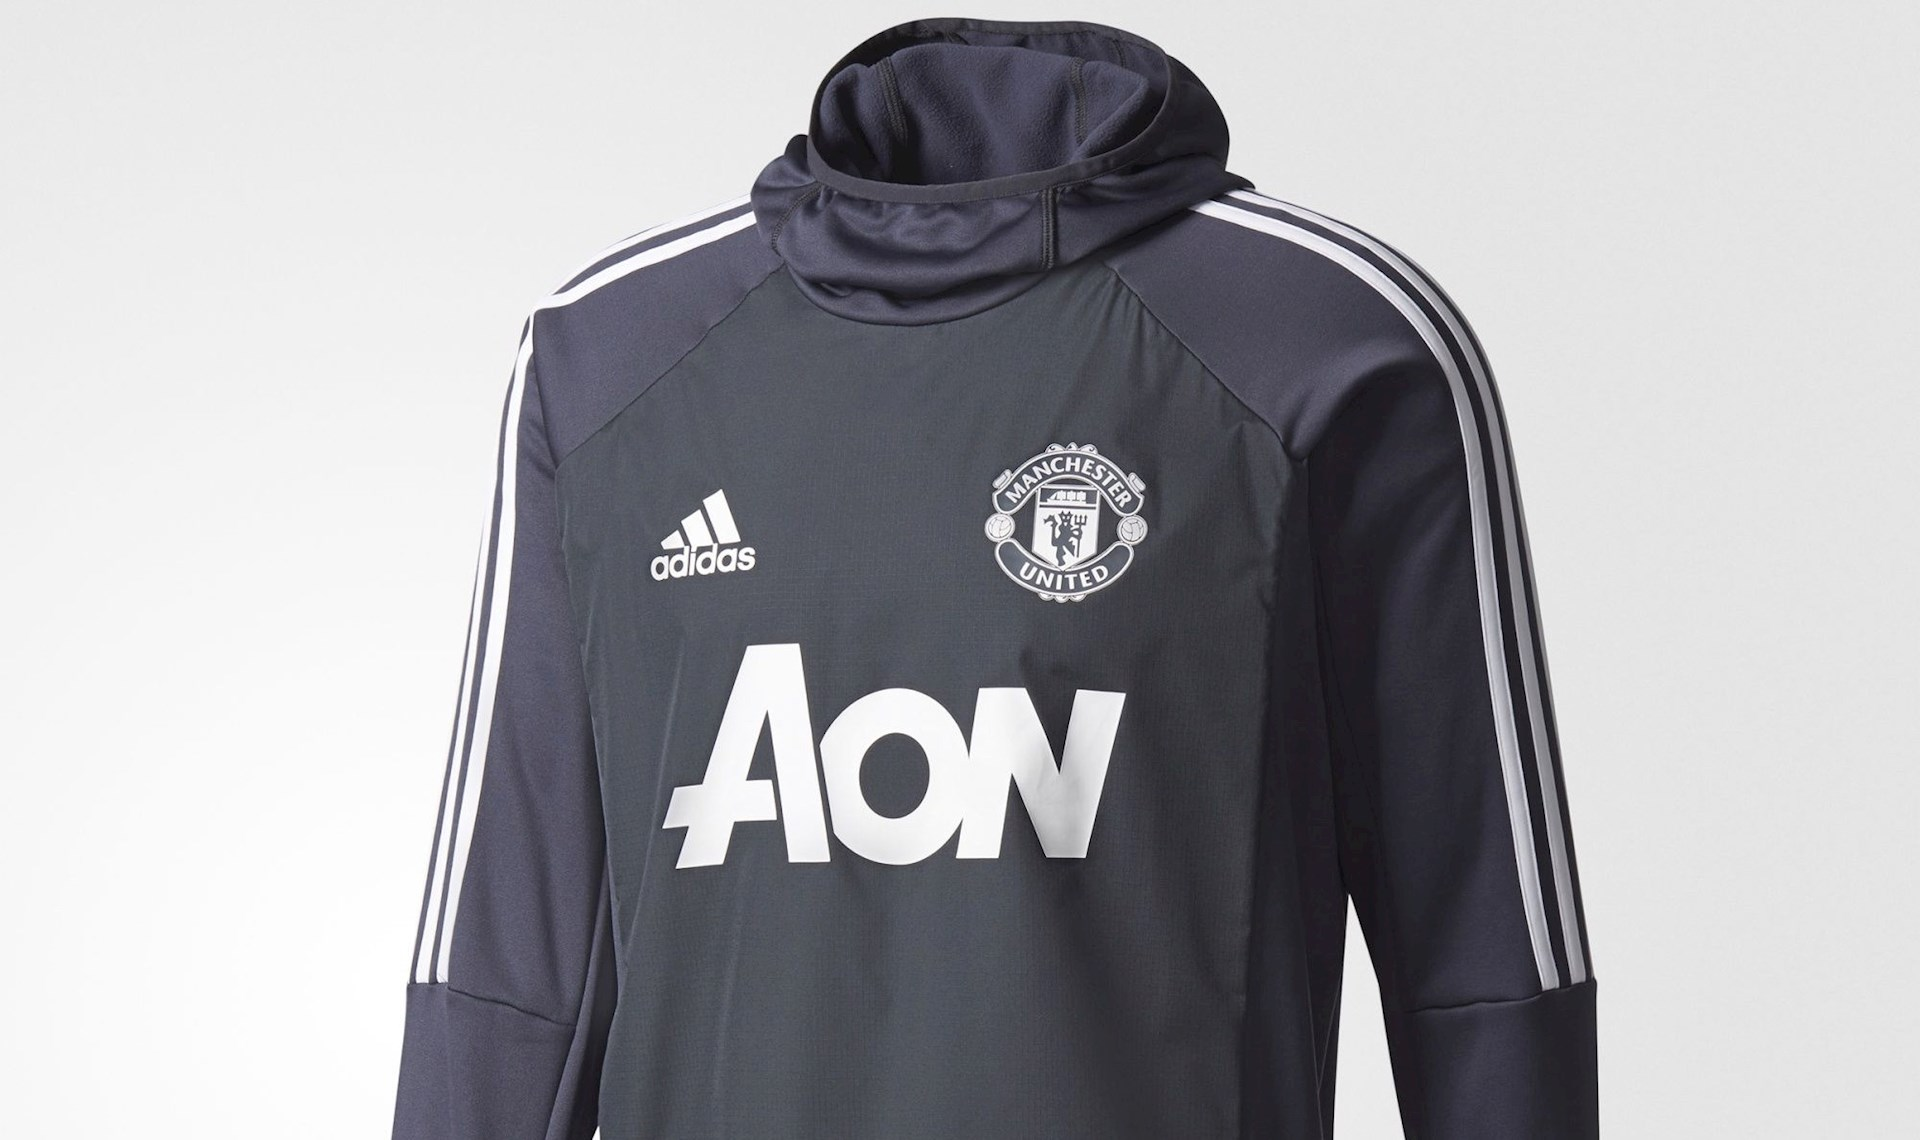 Manchester United winter trainingspak 2017 2018